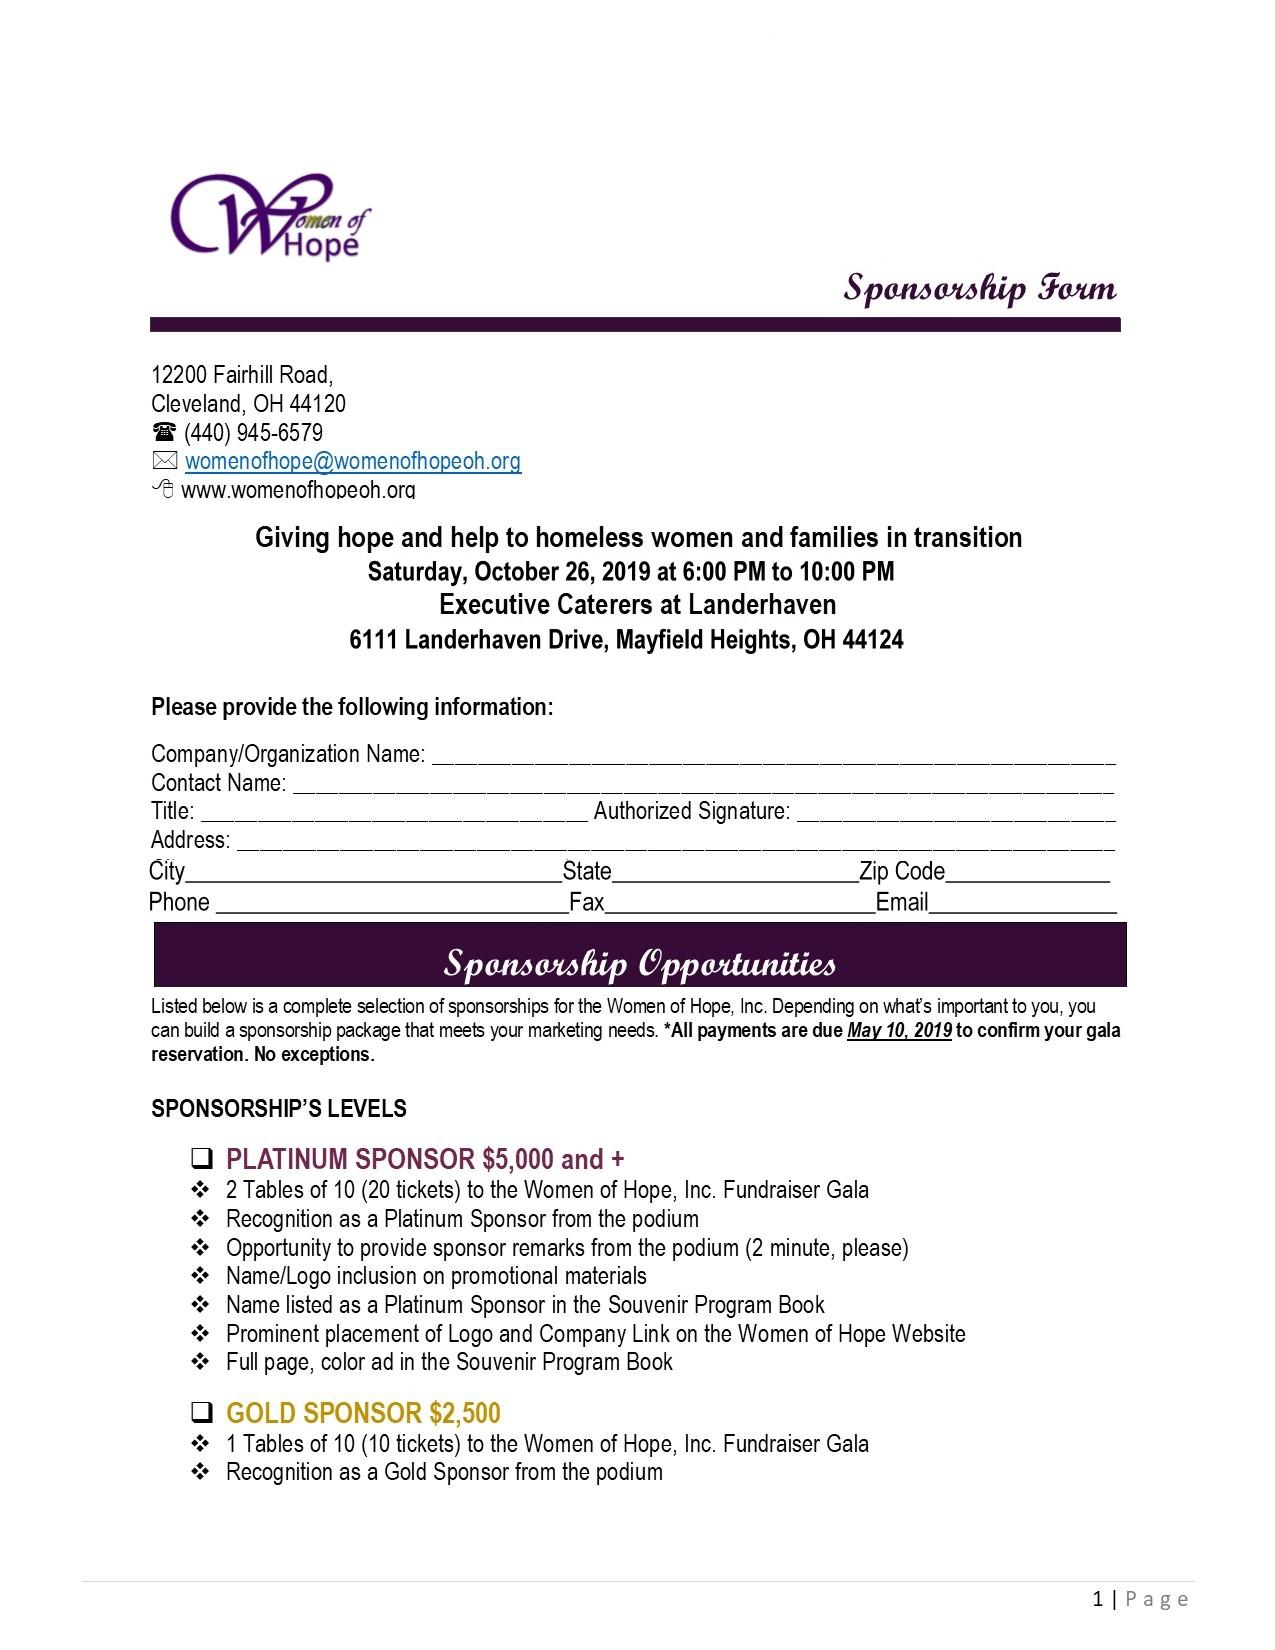 Sponsorship Form 1- Oct 26 - 2019